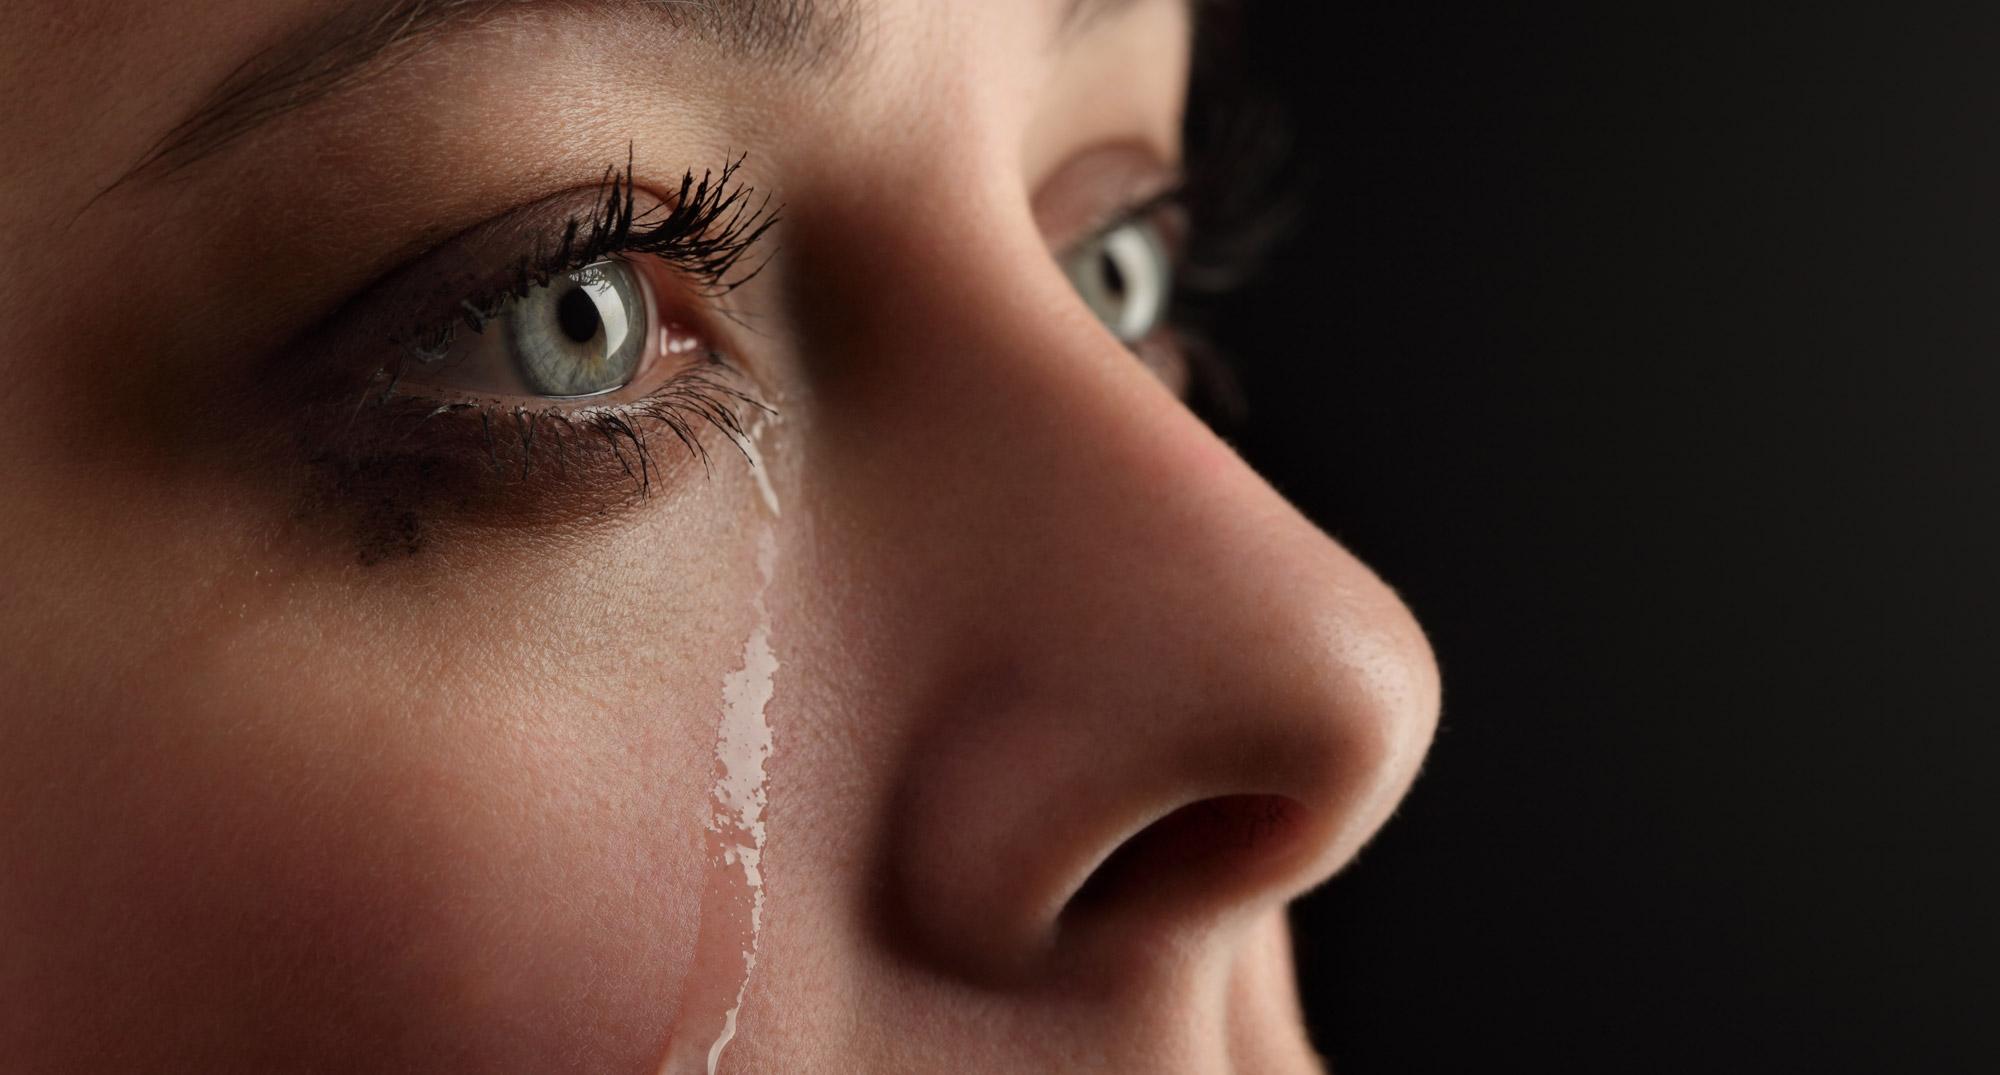 Trauma & its Effects